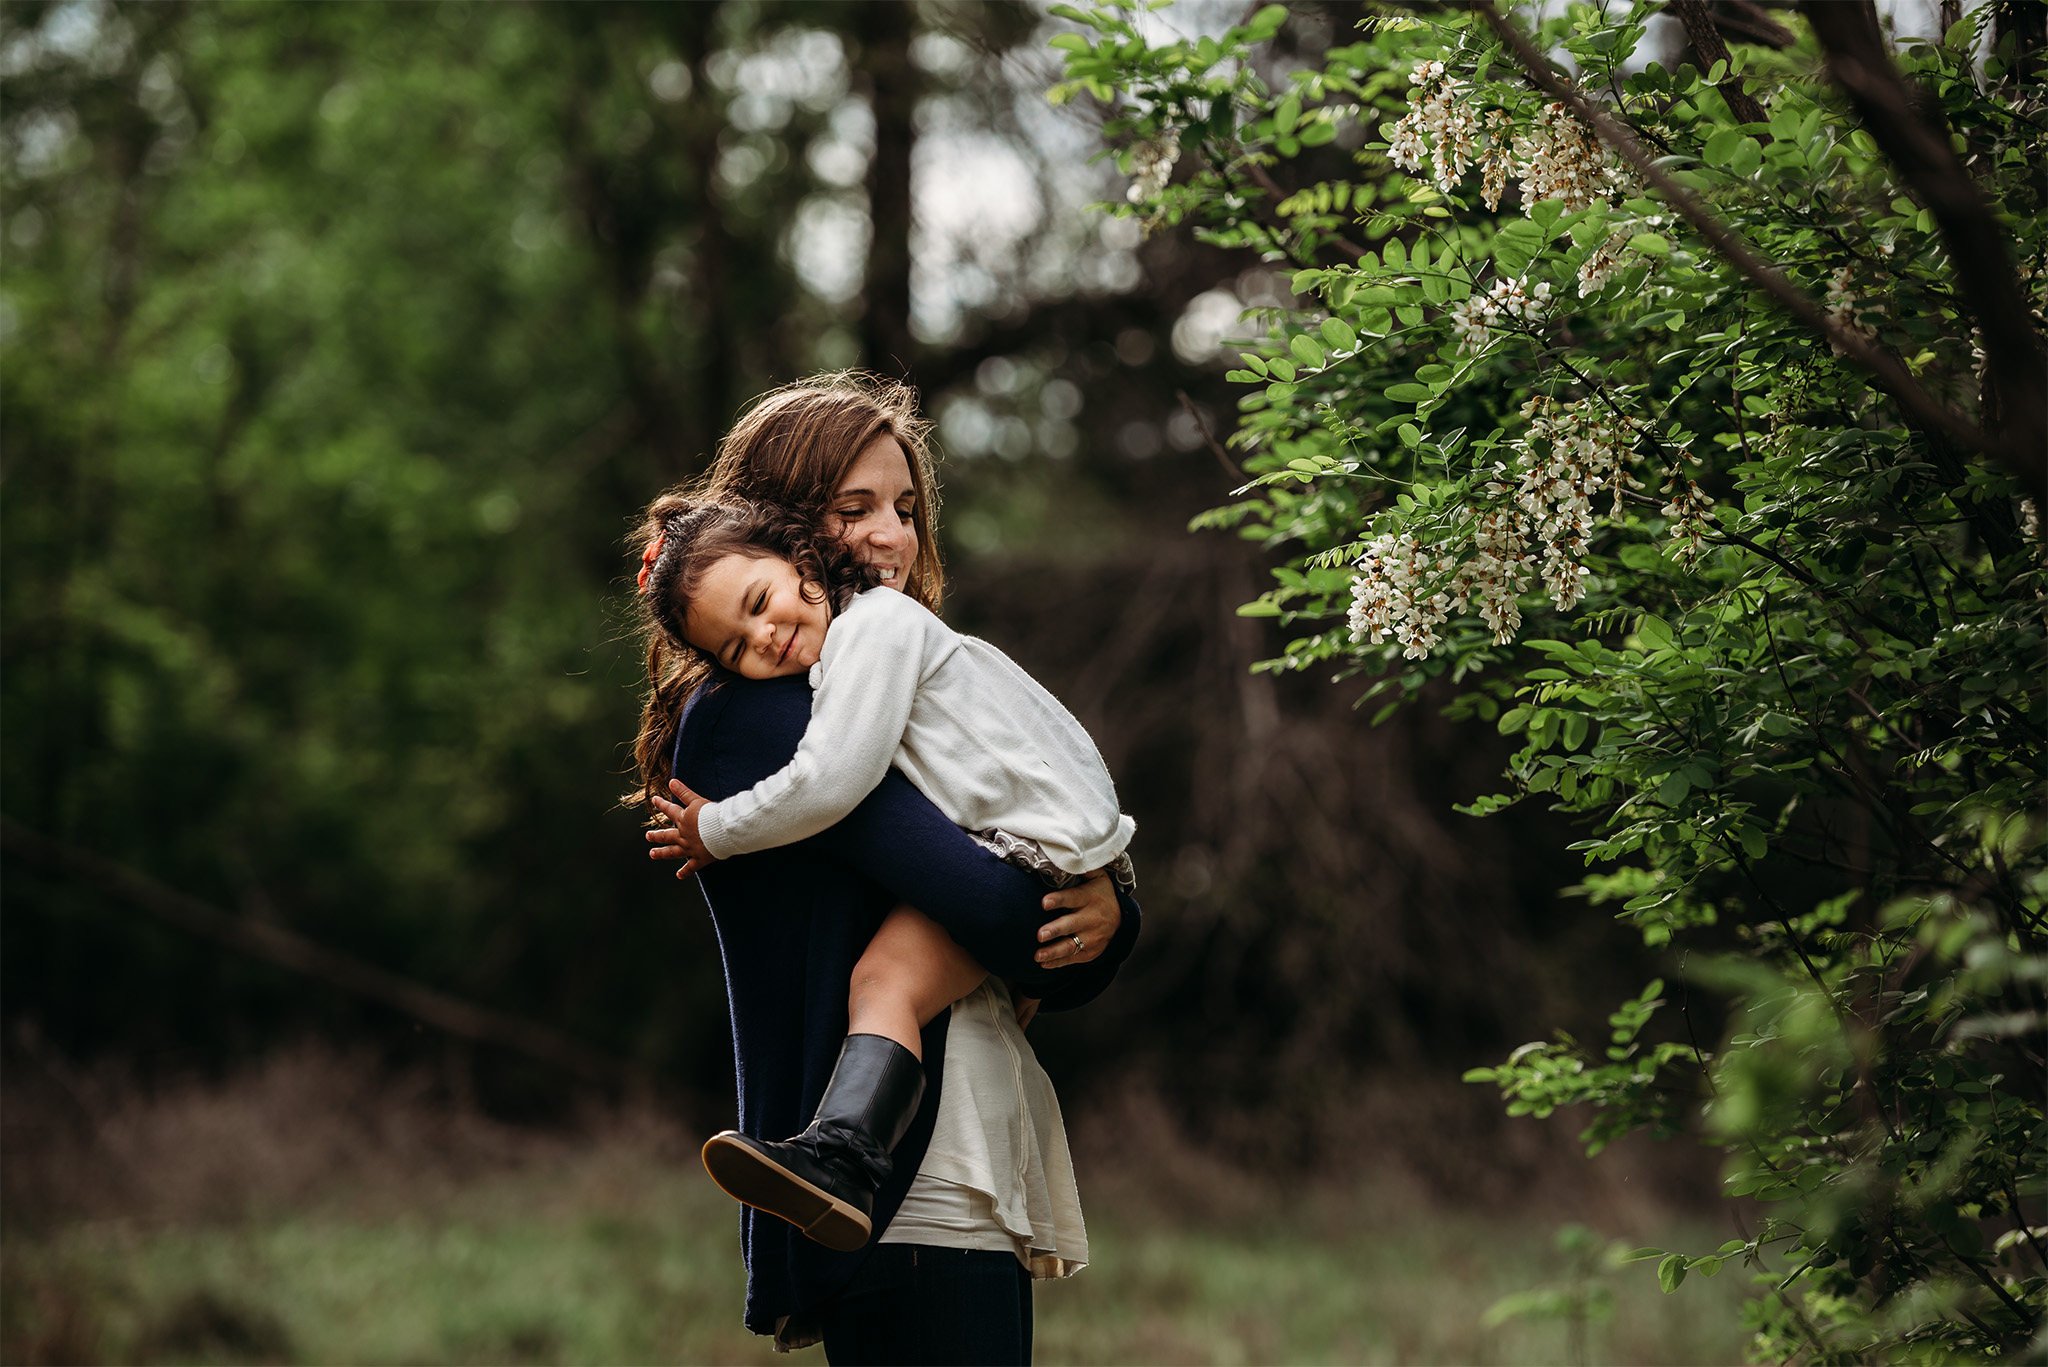 spokane_family_photographer_family_posing_3